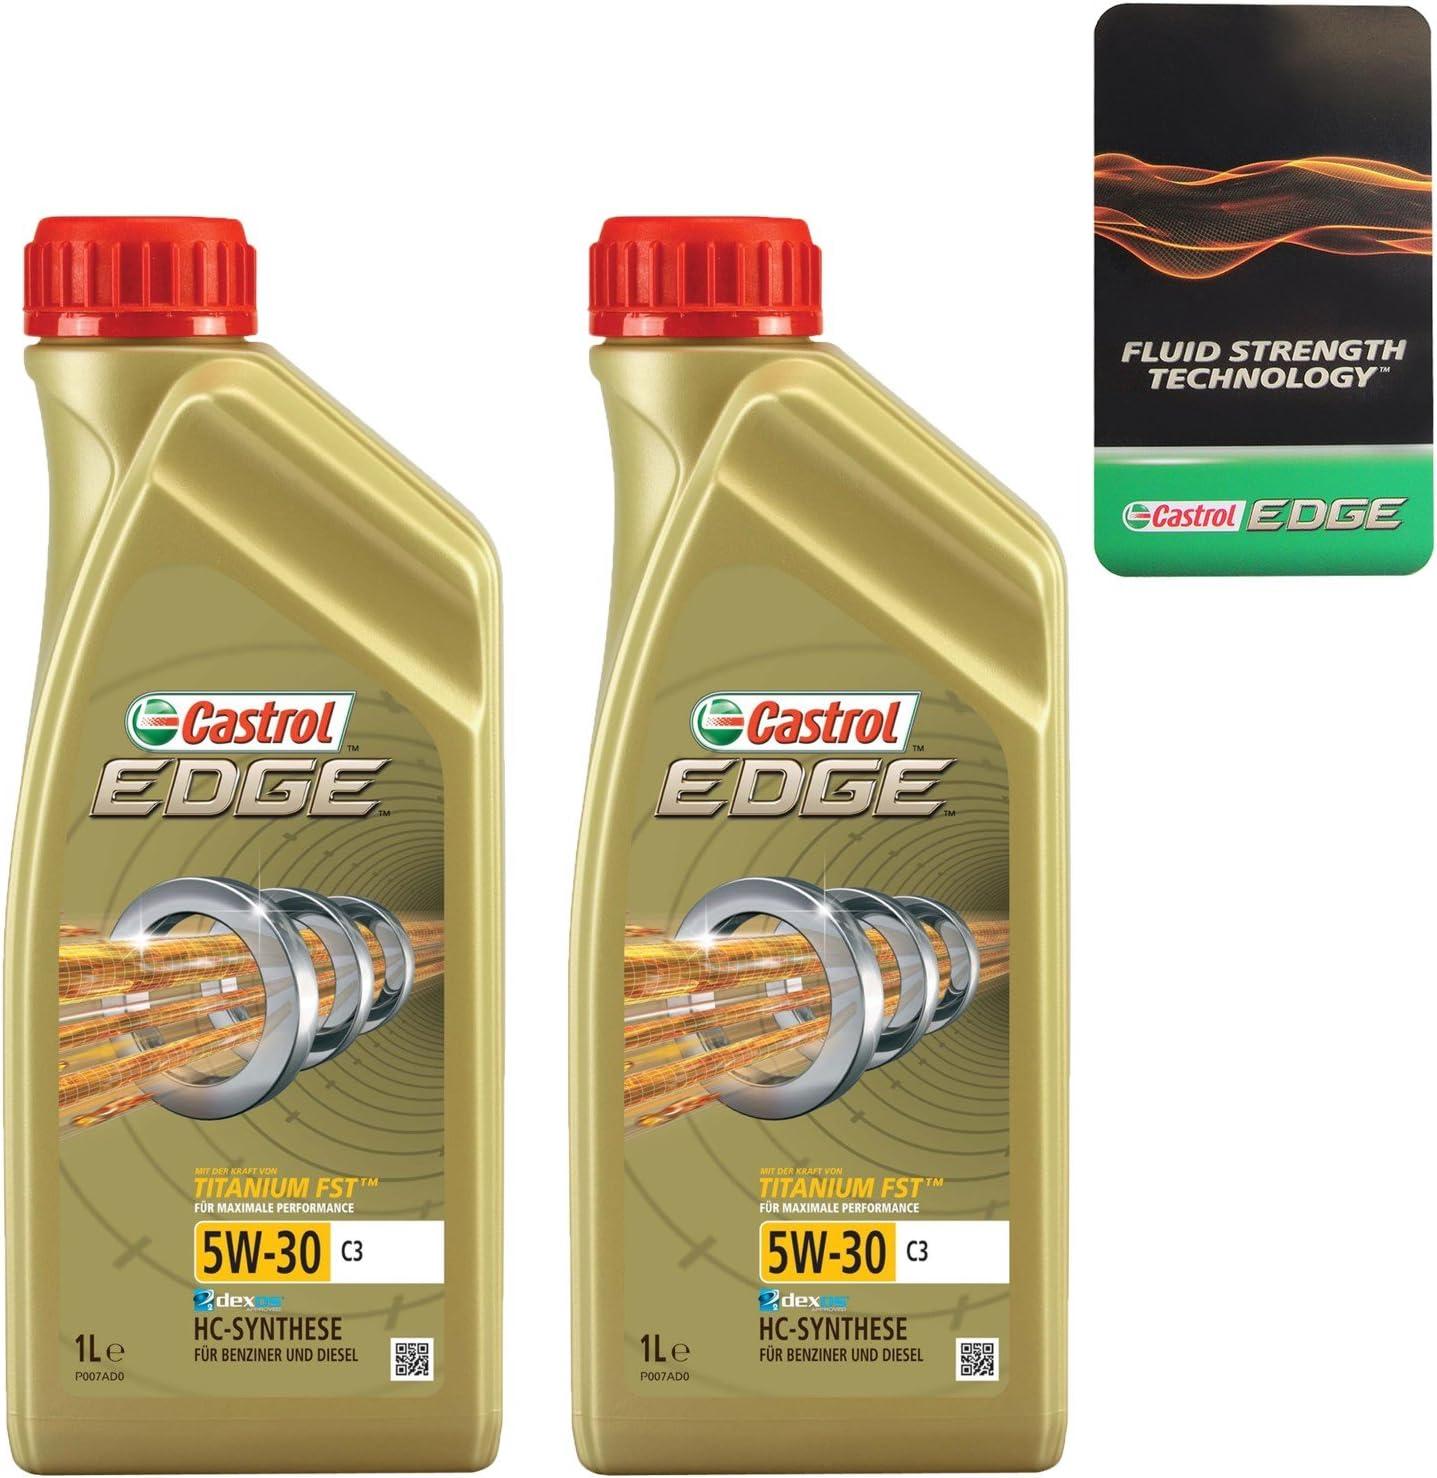 2x 1 L Liter Castrol Edge Fluid Titanium 5w 30 C3 Motoröl Inkl Castrol Ölwechselanhänger Auto